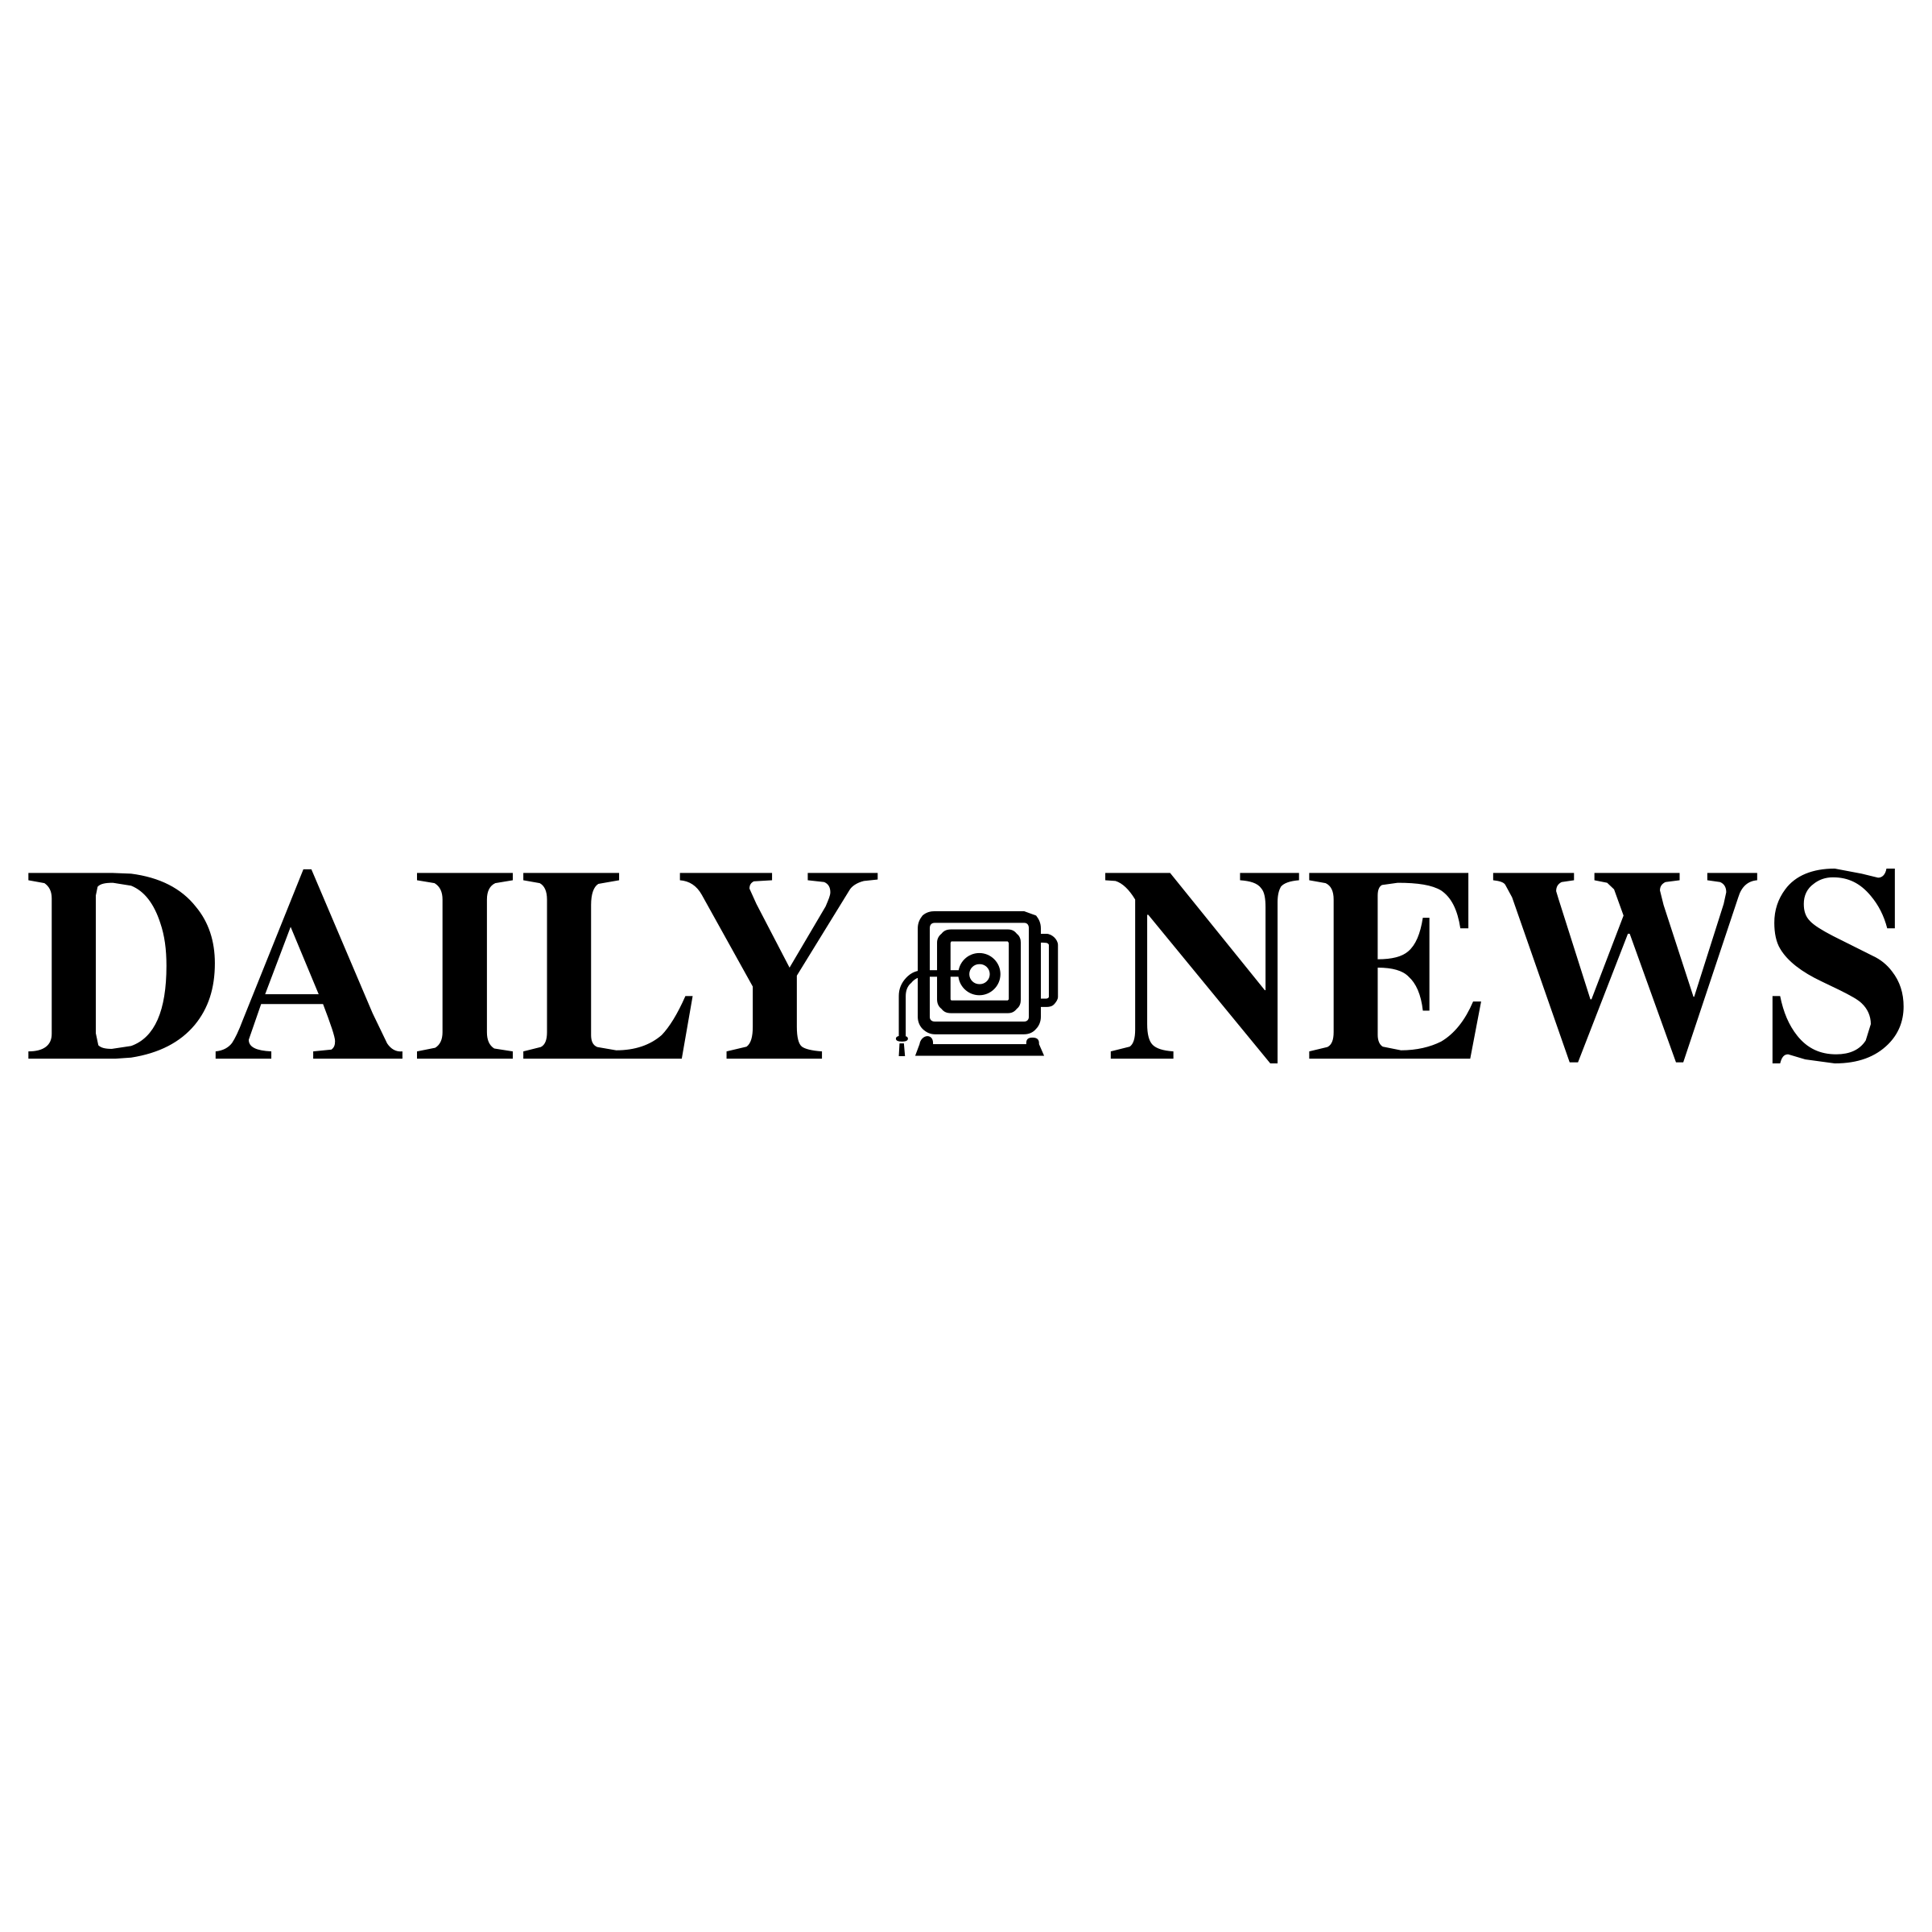 daily-news-1-logo-png-transparent